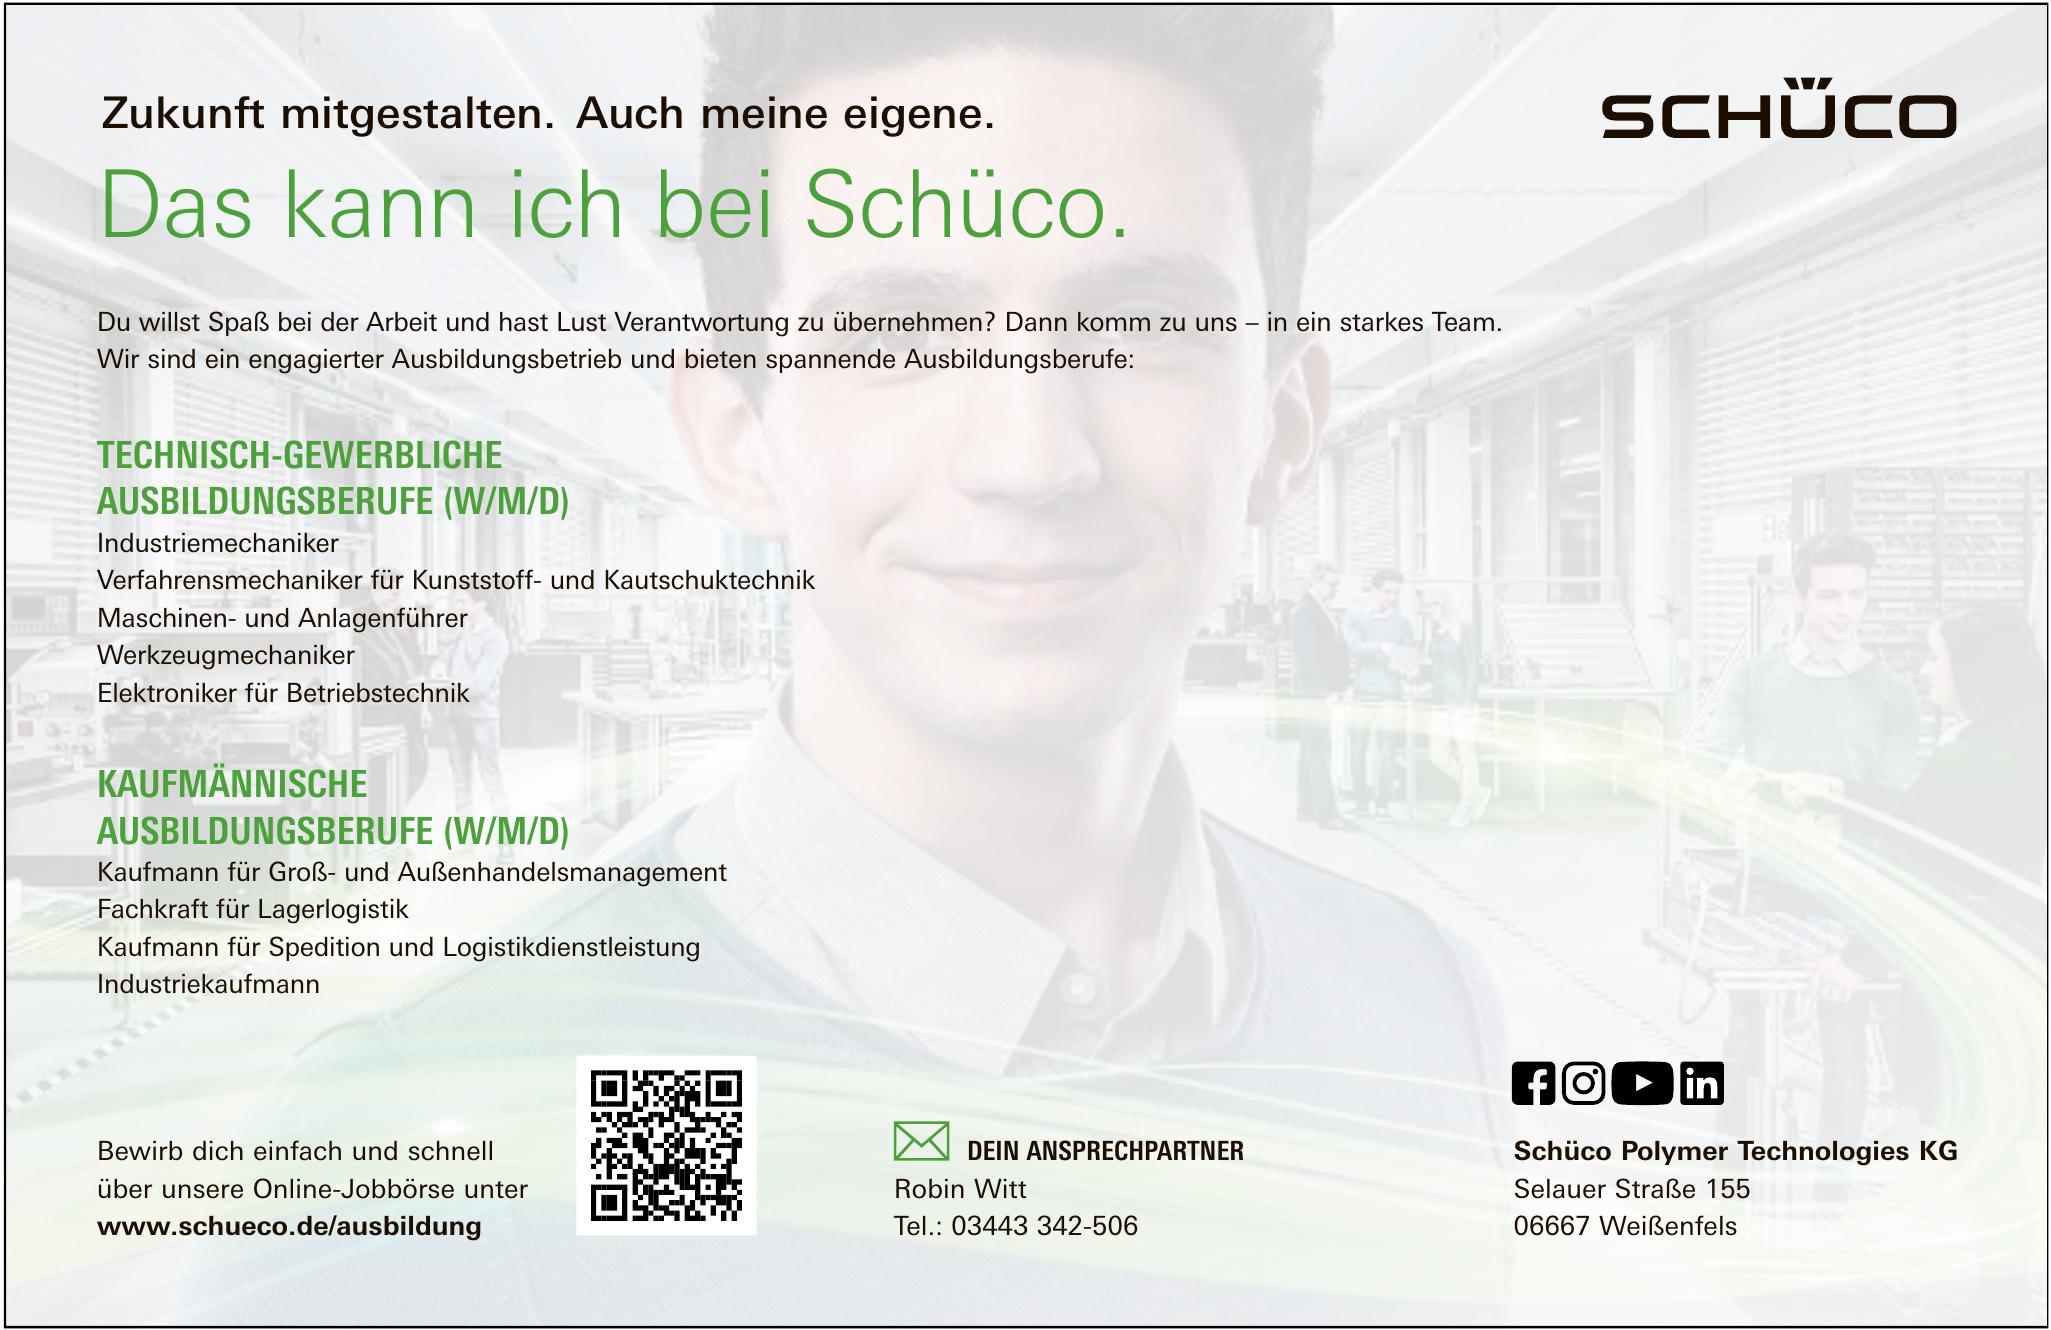 Schüco Polymer Technologies KG